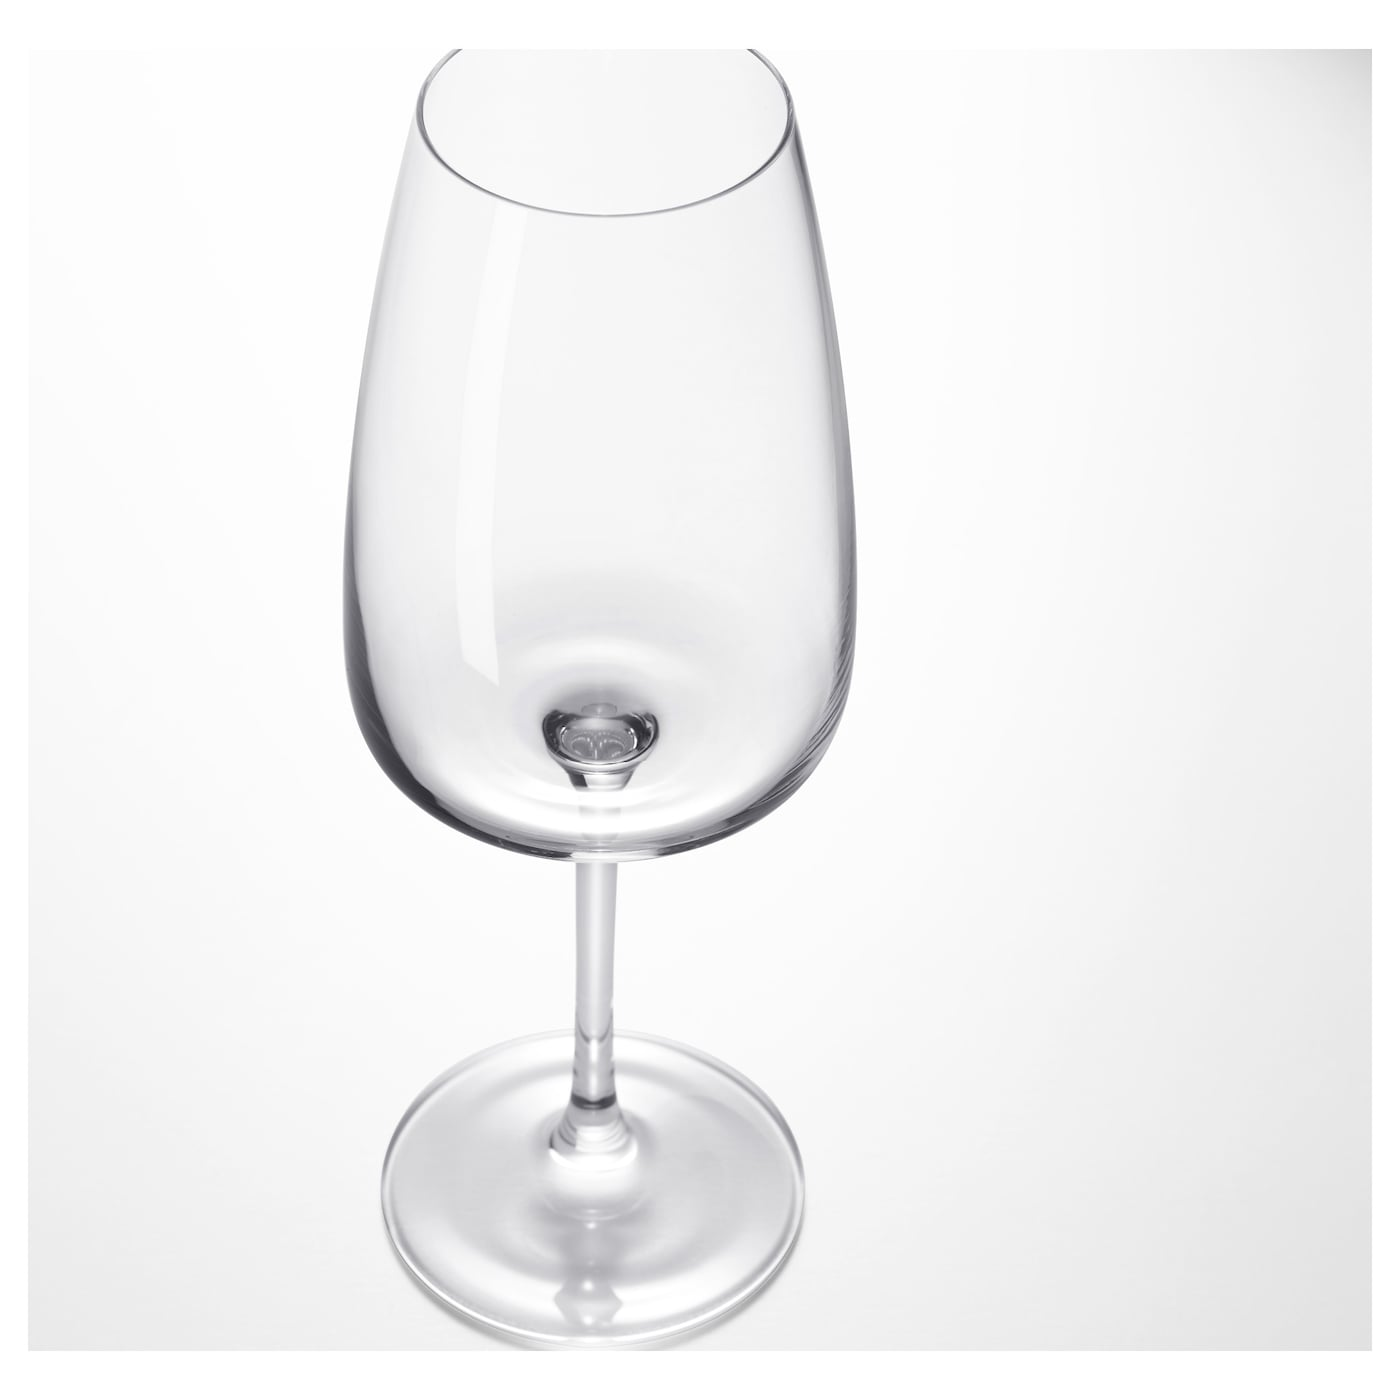 DYRGRIP كأس, زجاج شفاف, 42 سل